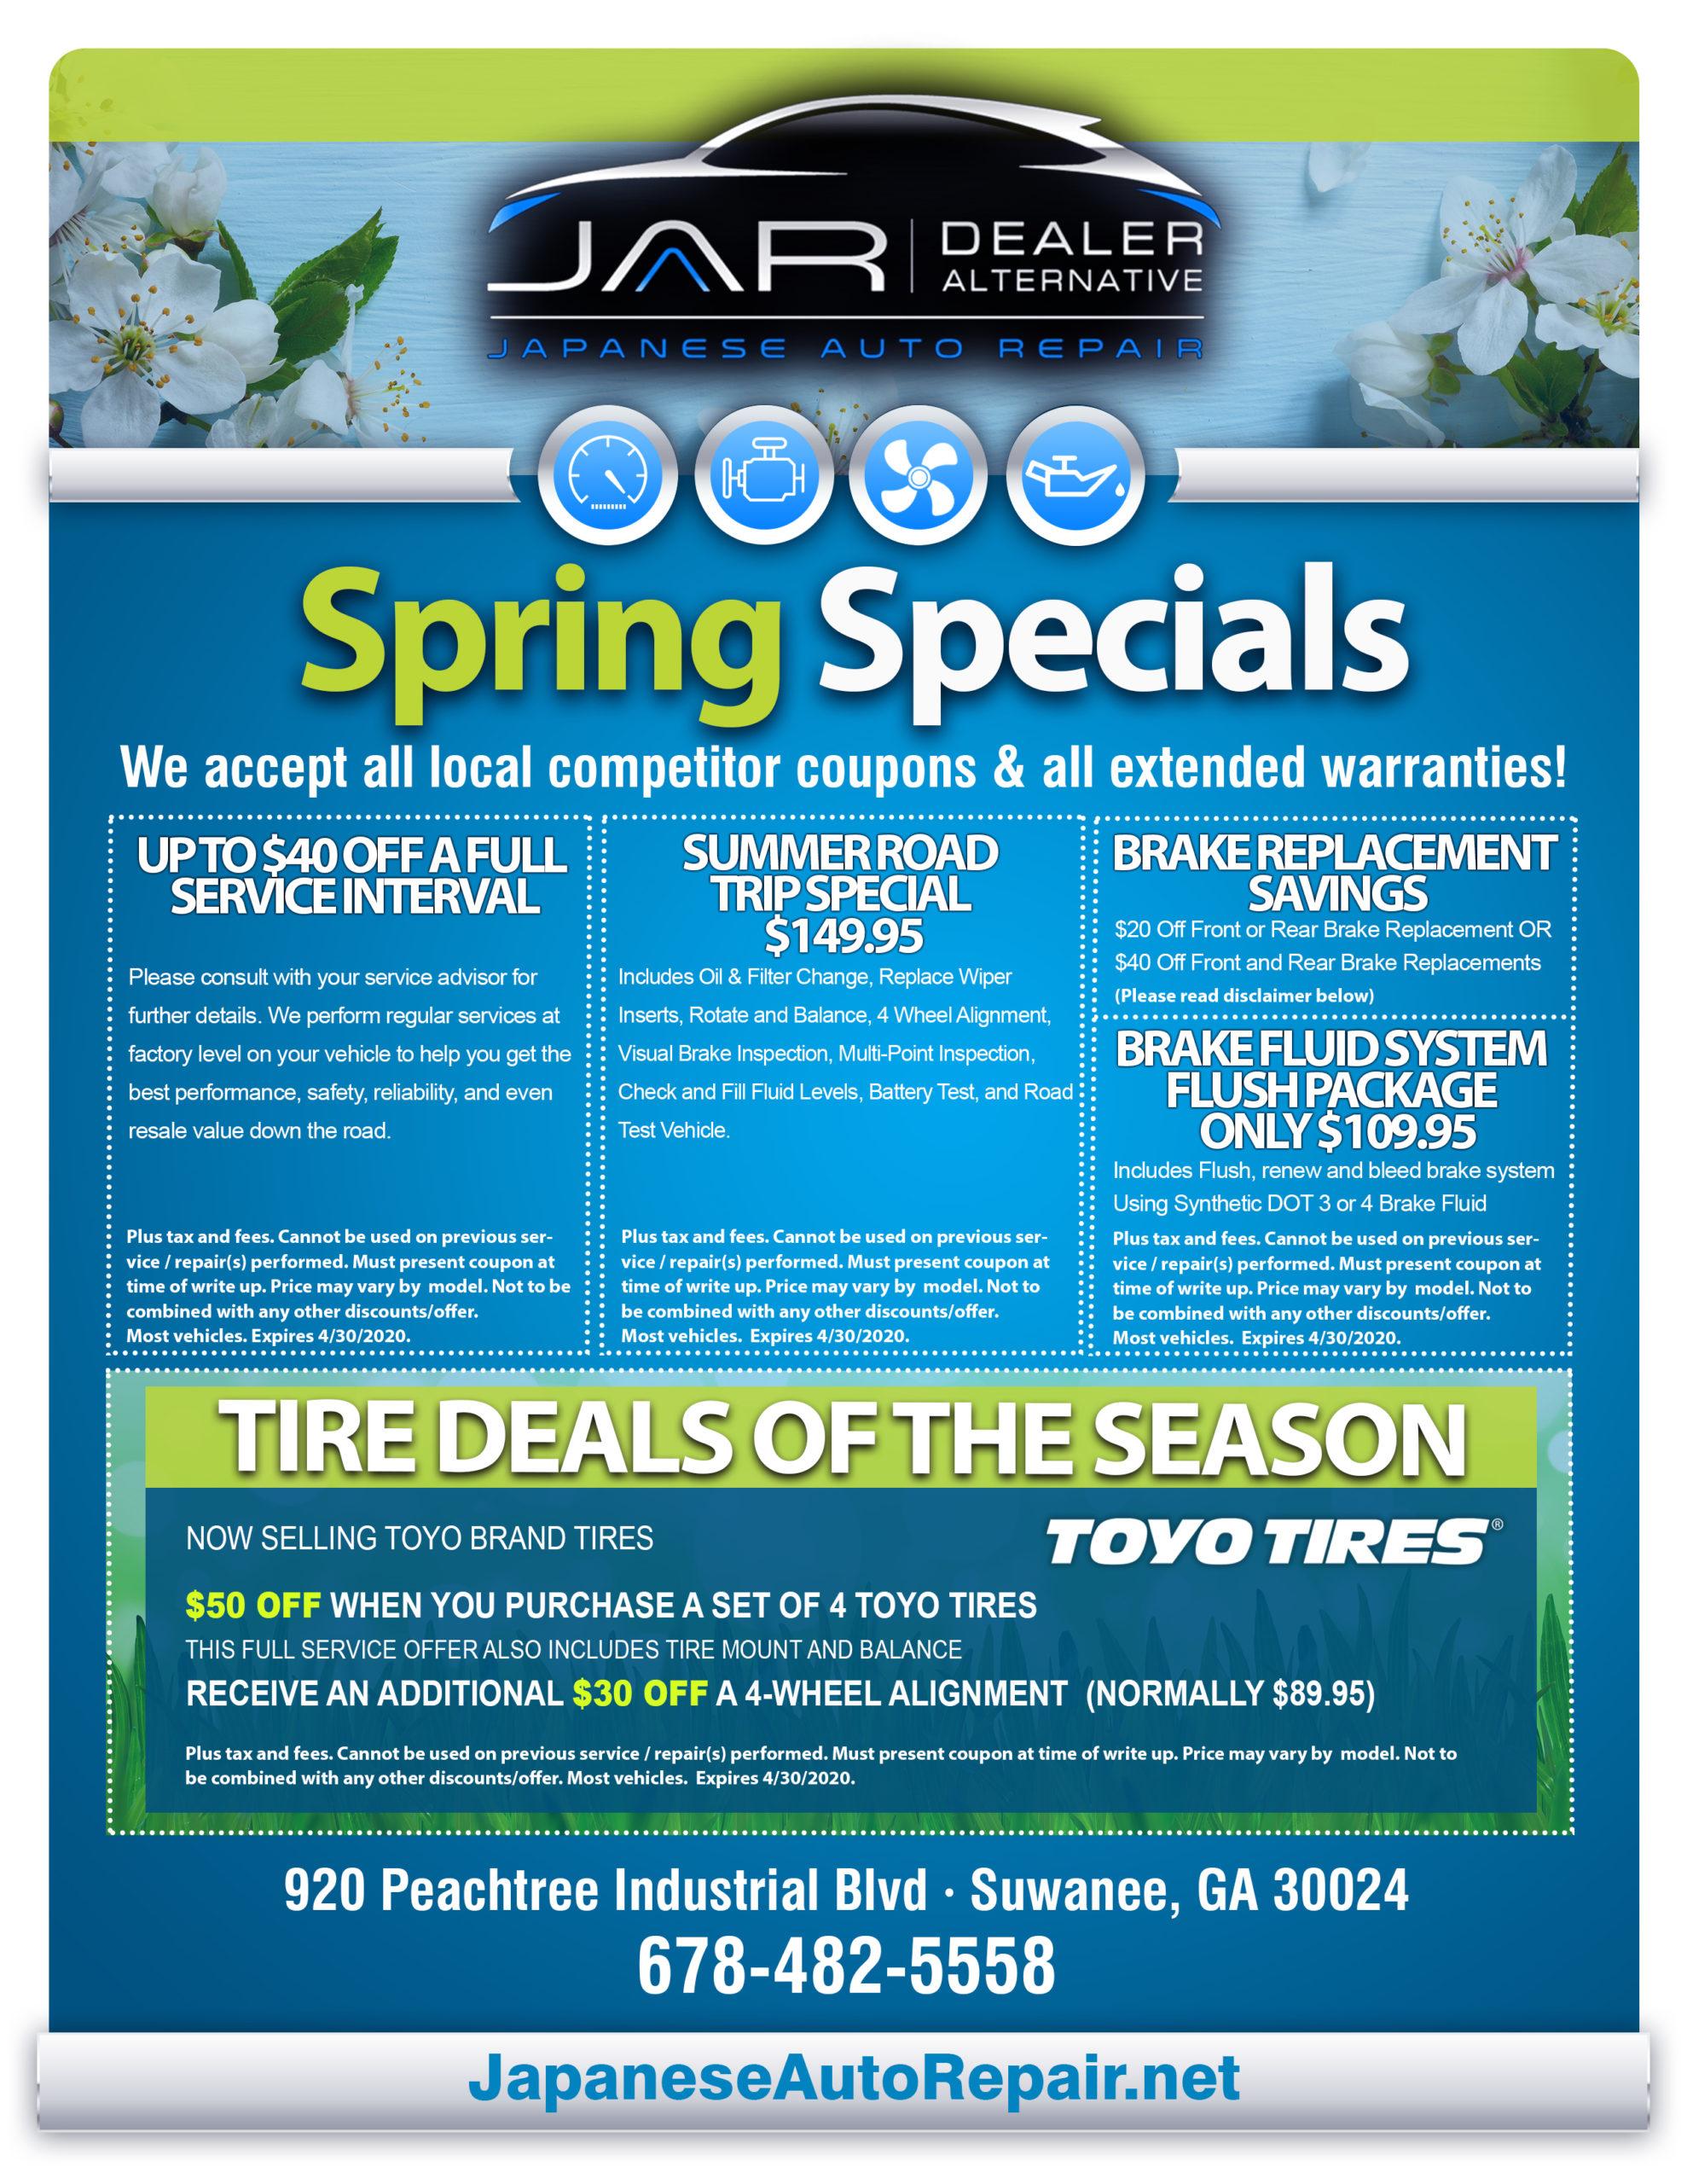 JAR_Spring_Specials_Final_Version